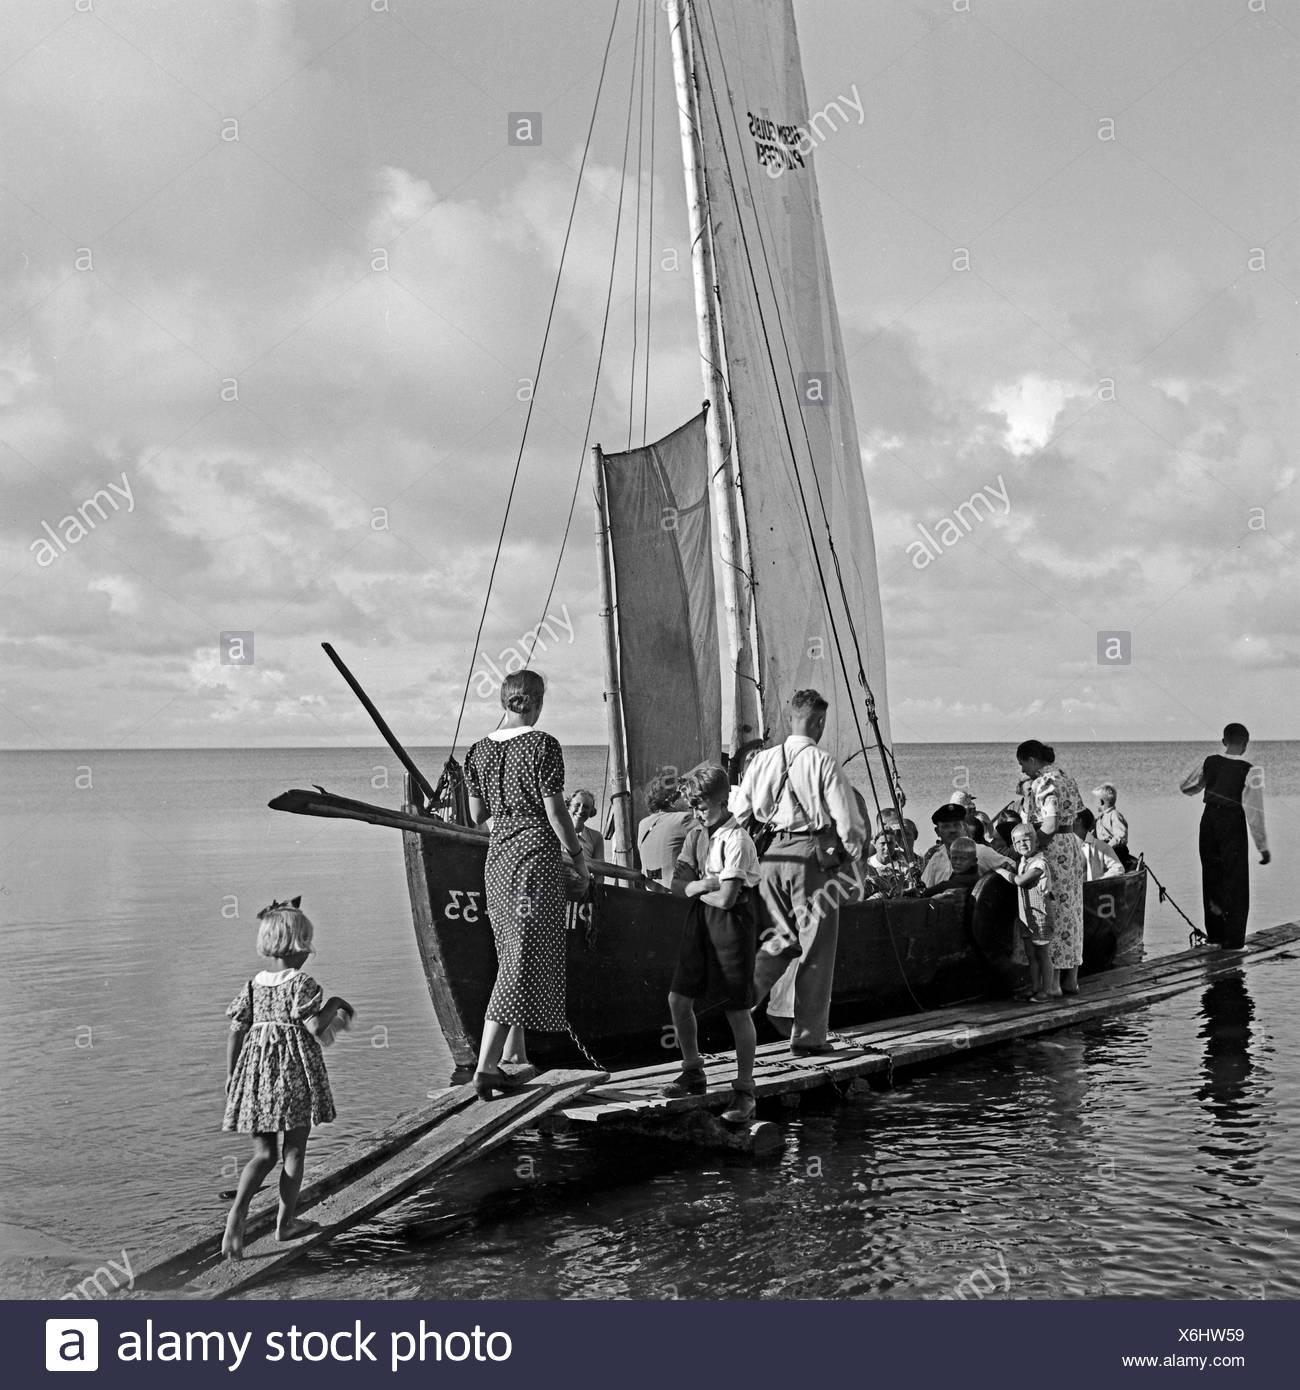 Ein Segelboot als Personenbeförderung nahe Pillkoppen an der Ostsee in Ostpreußen, Deutschland 1930er Jahre. A sailing boat as a means of public transport at Pillkoppen in East Prussia, Germany 1930s. - Stock Image